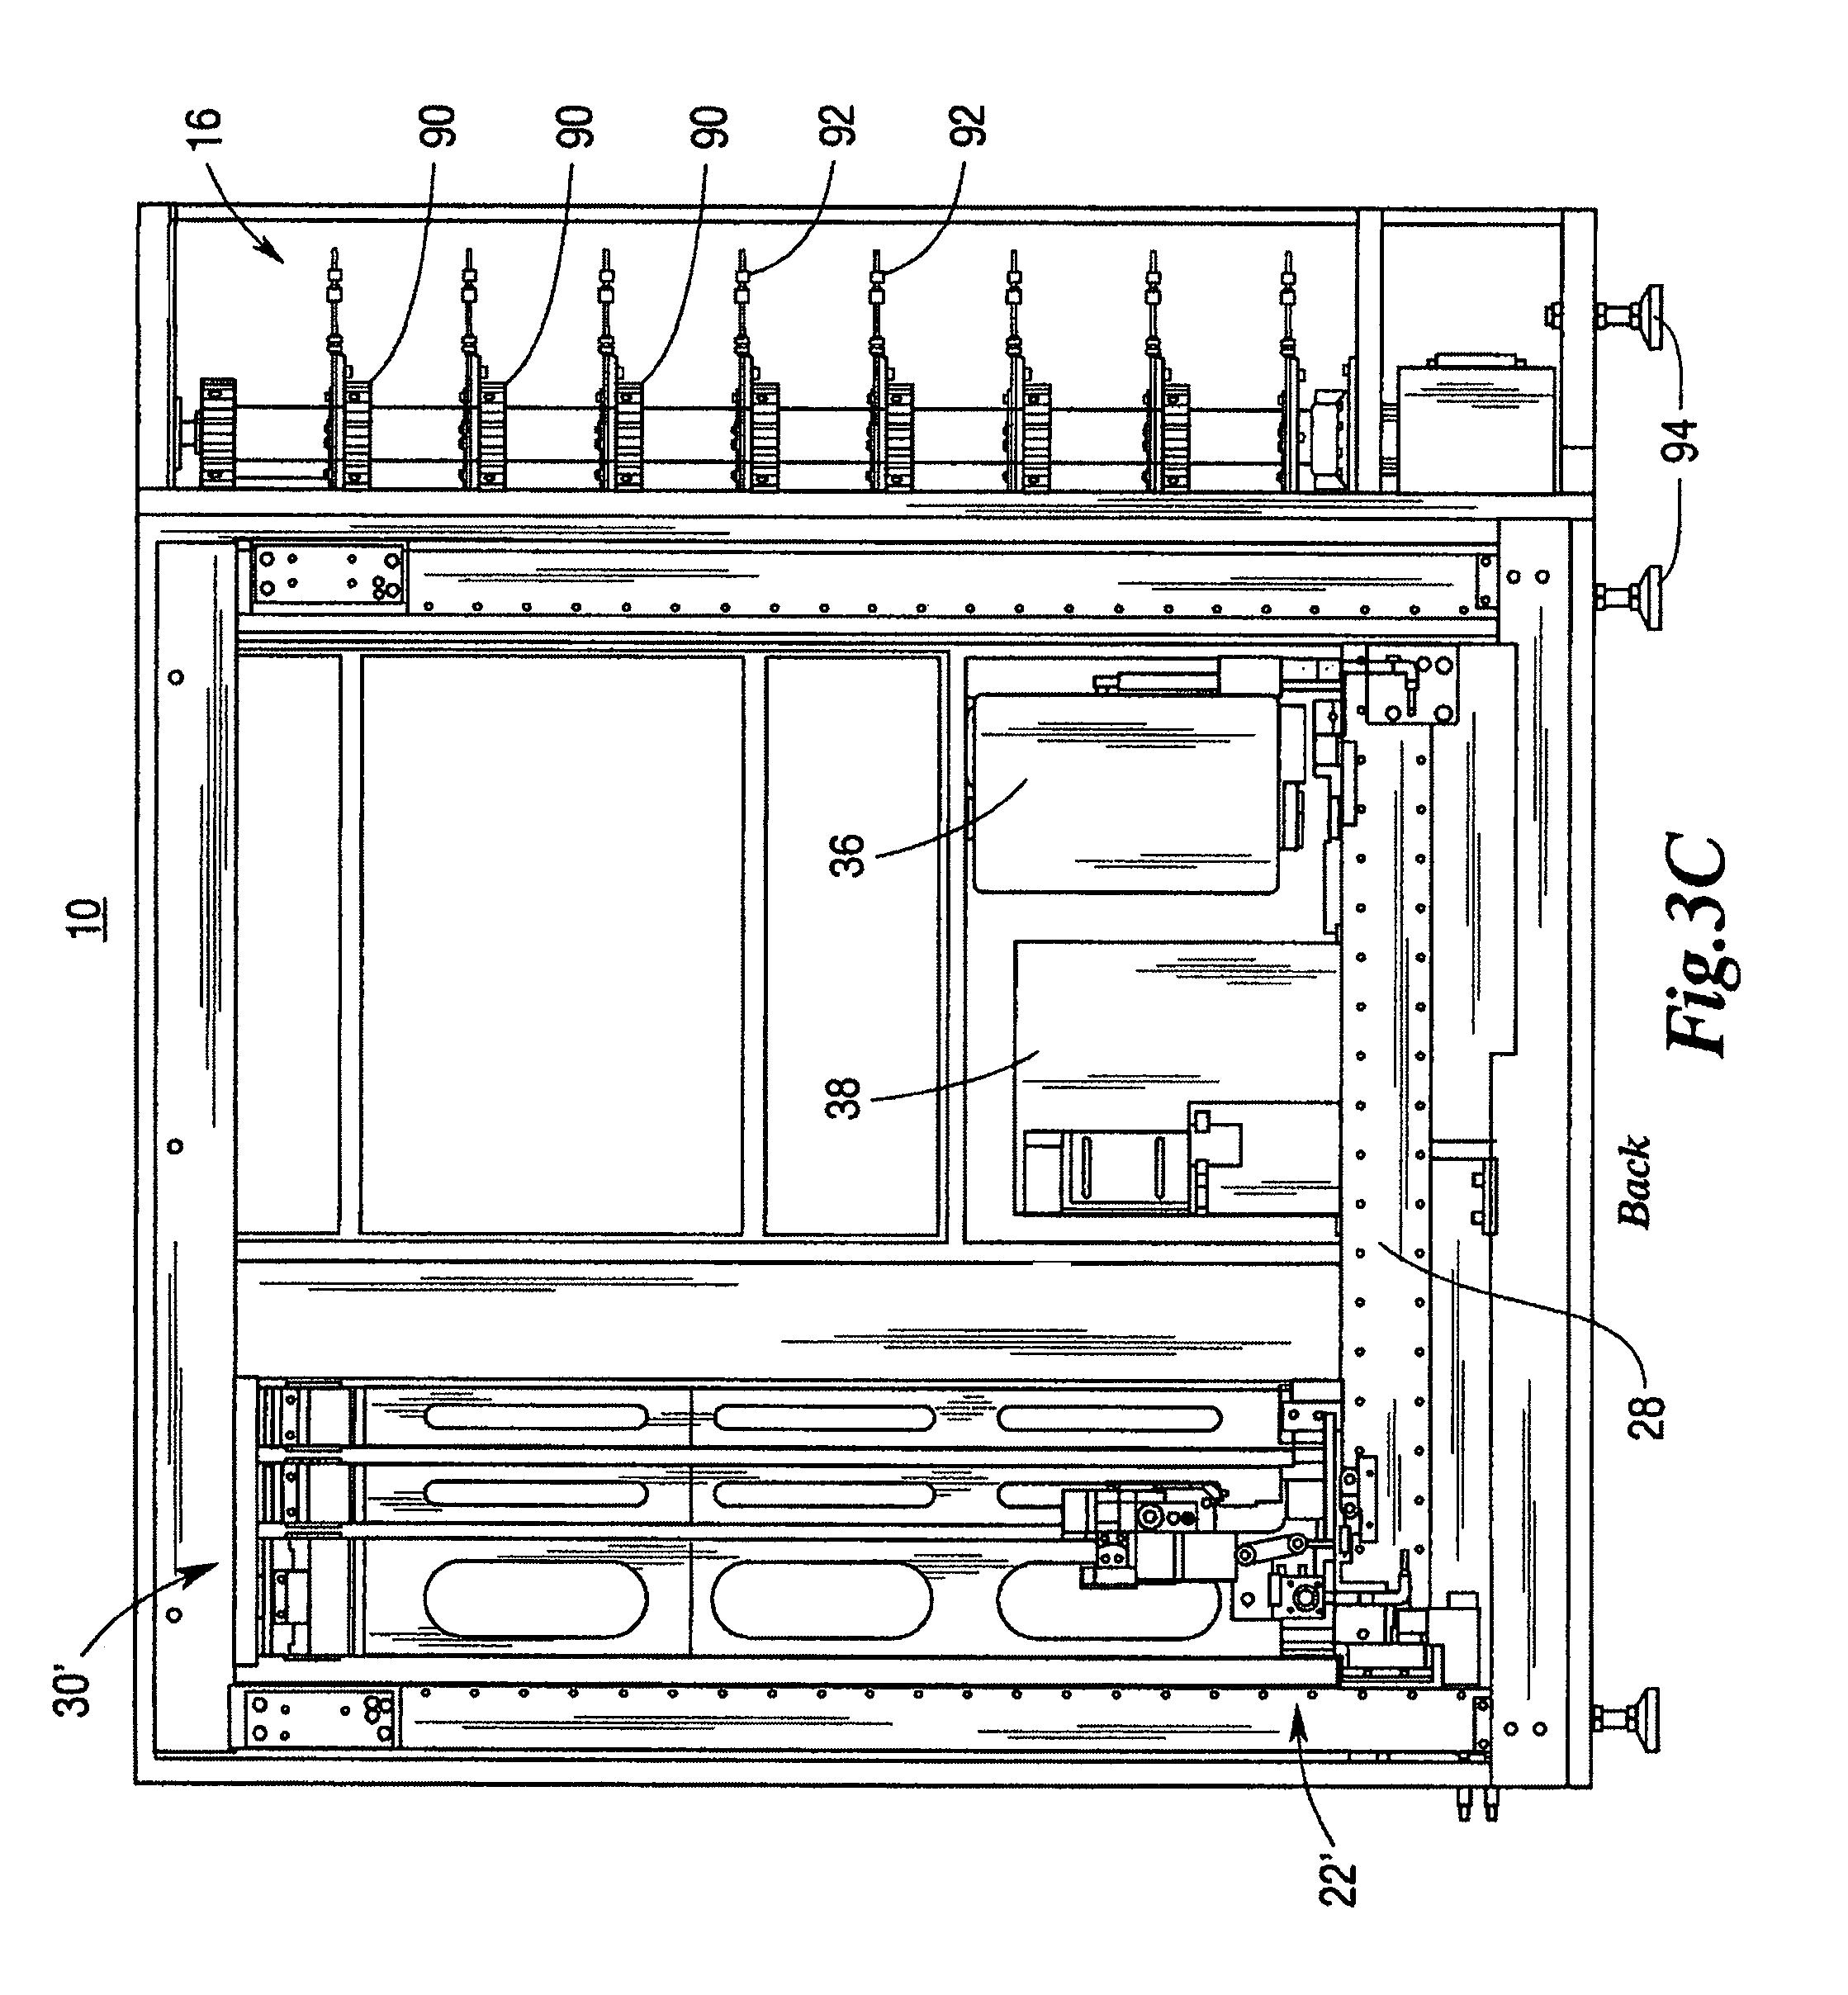 Patent US 9,037,285 B2